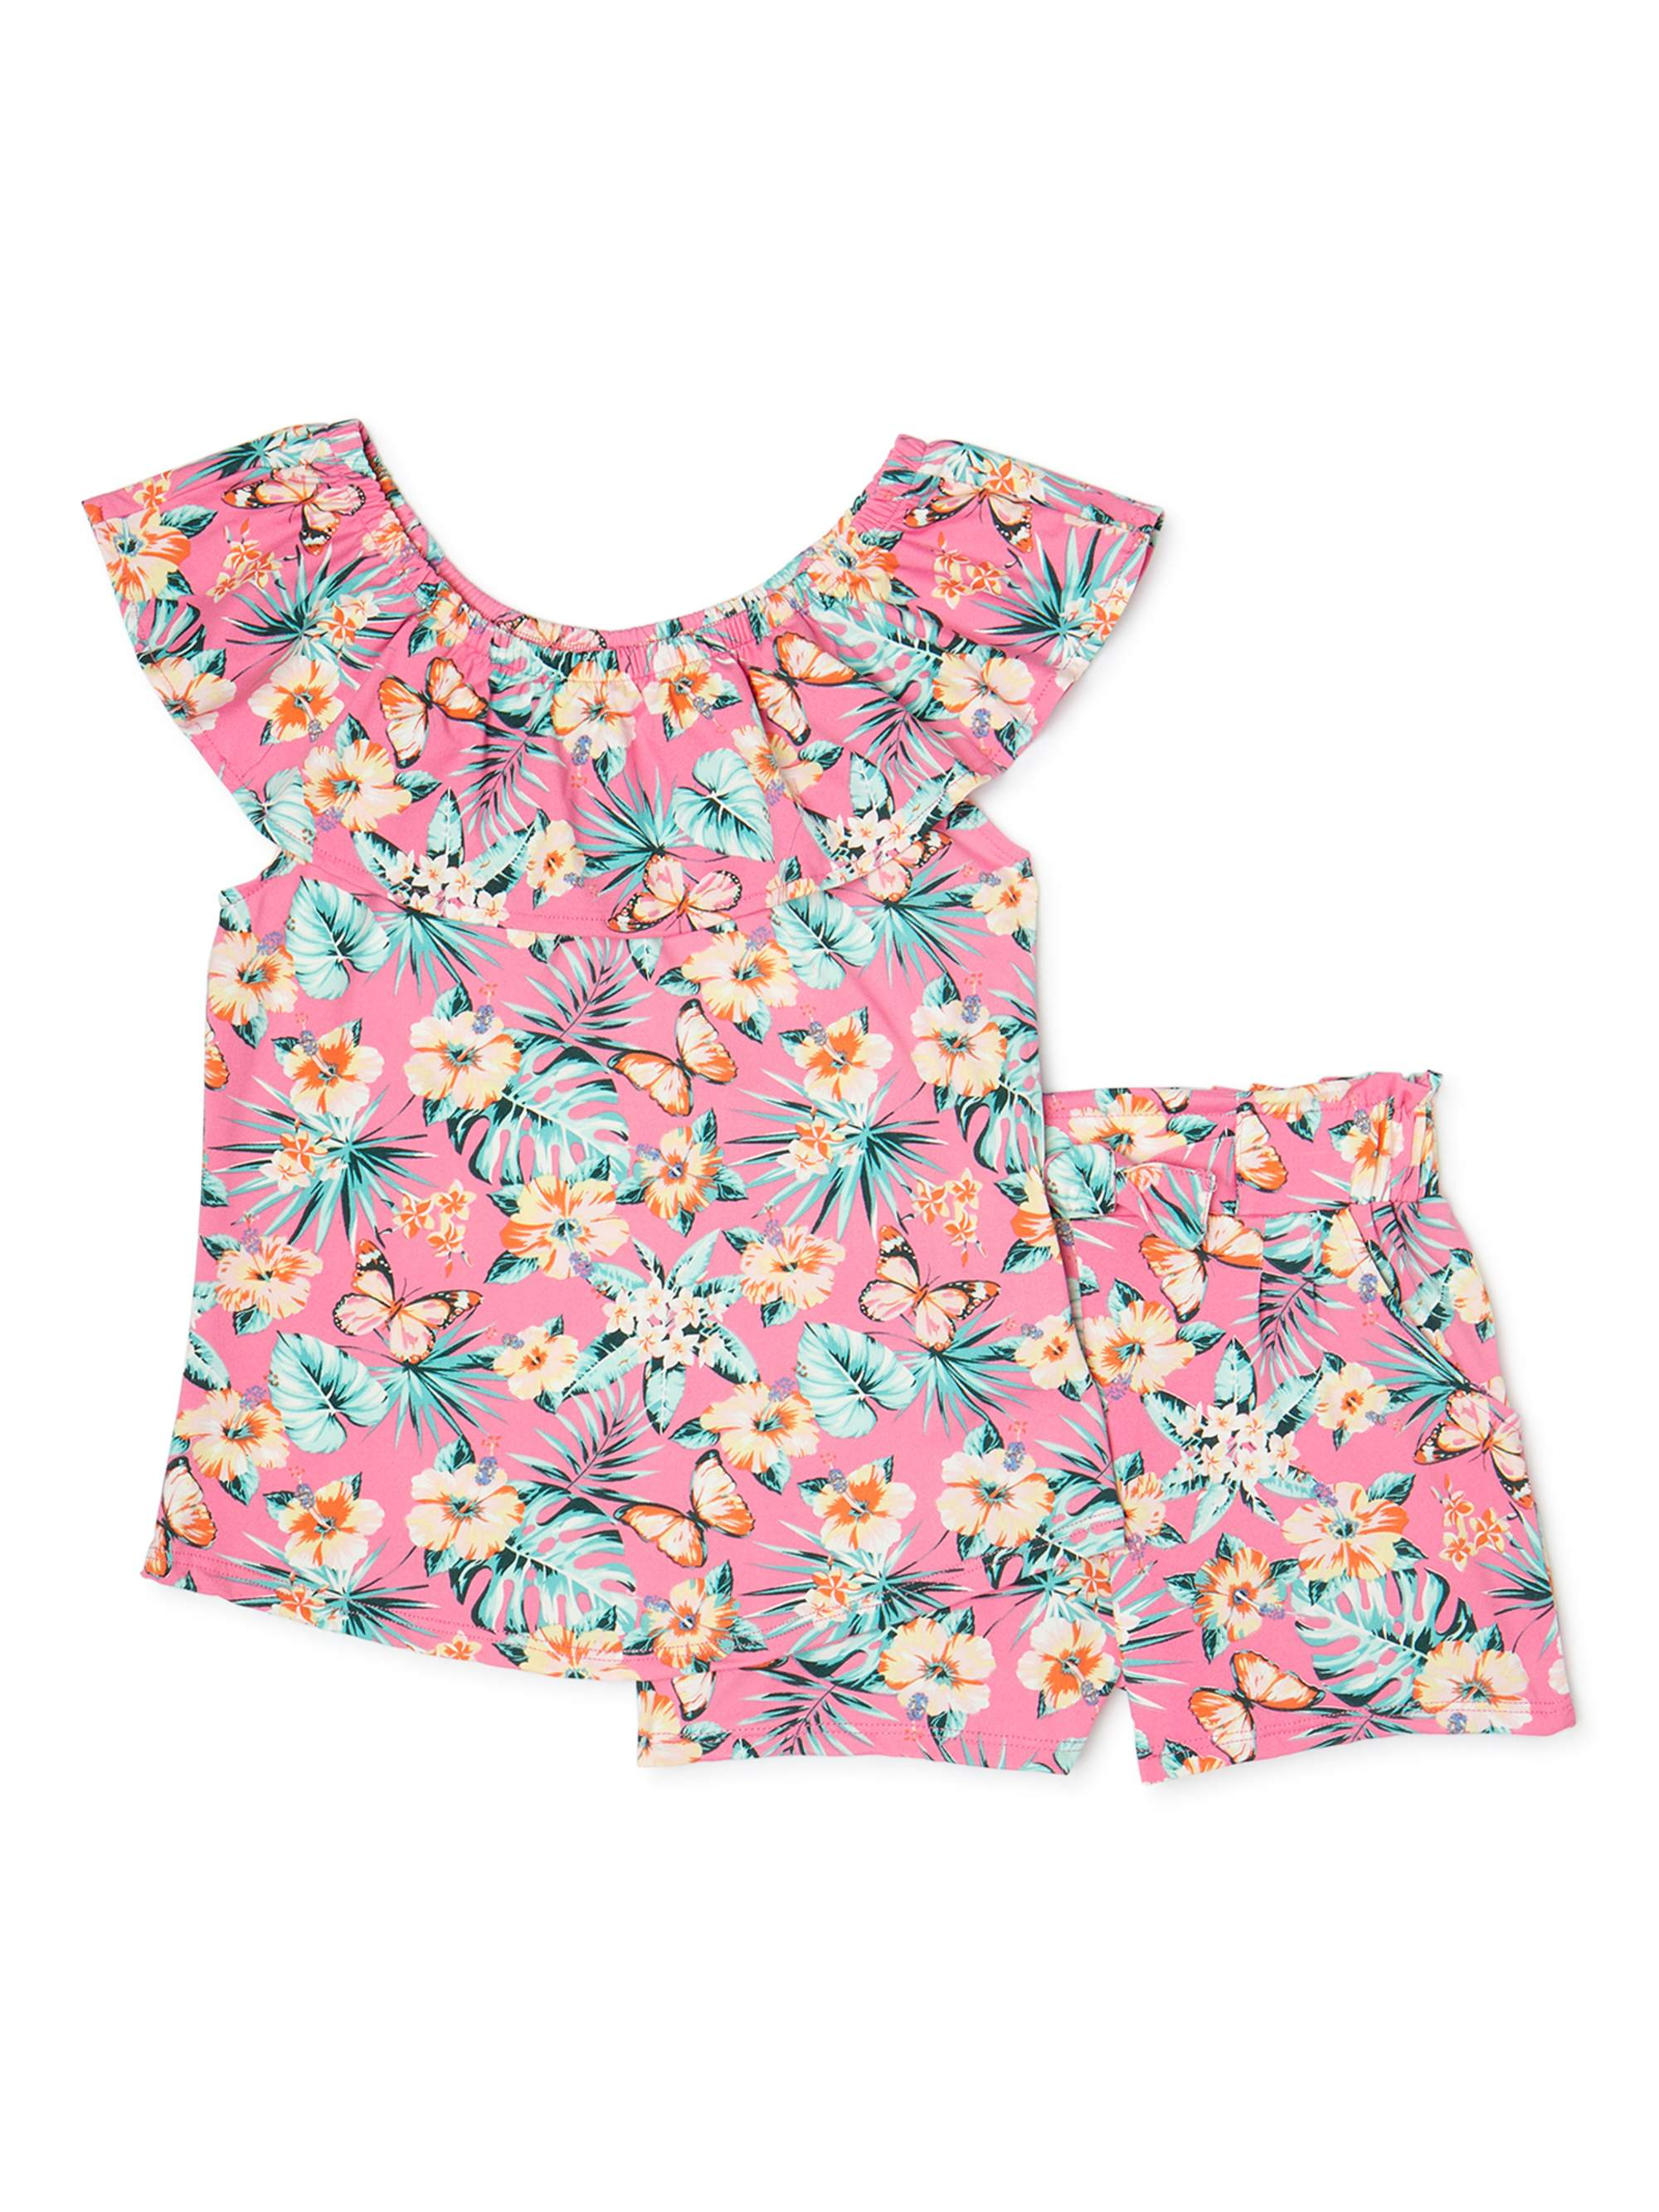 1 3 4 New Absolutely Stunning Toddler//Girls 2 Piece Summer Set Size